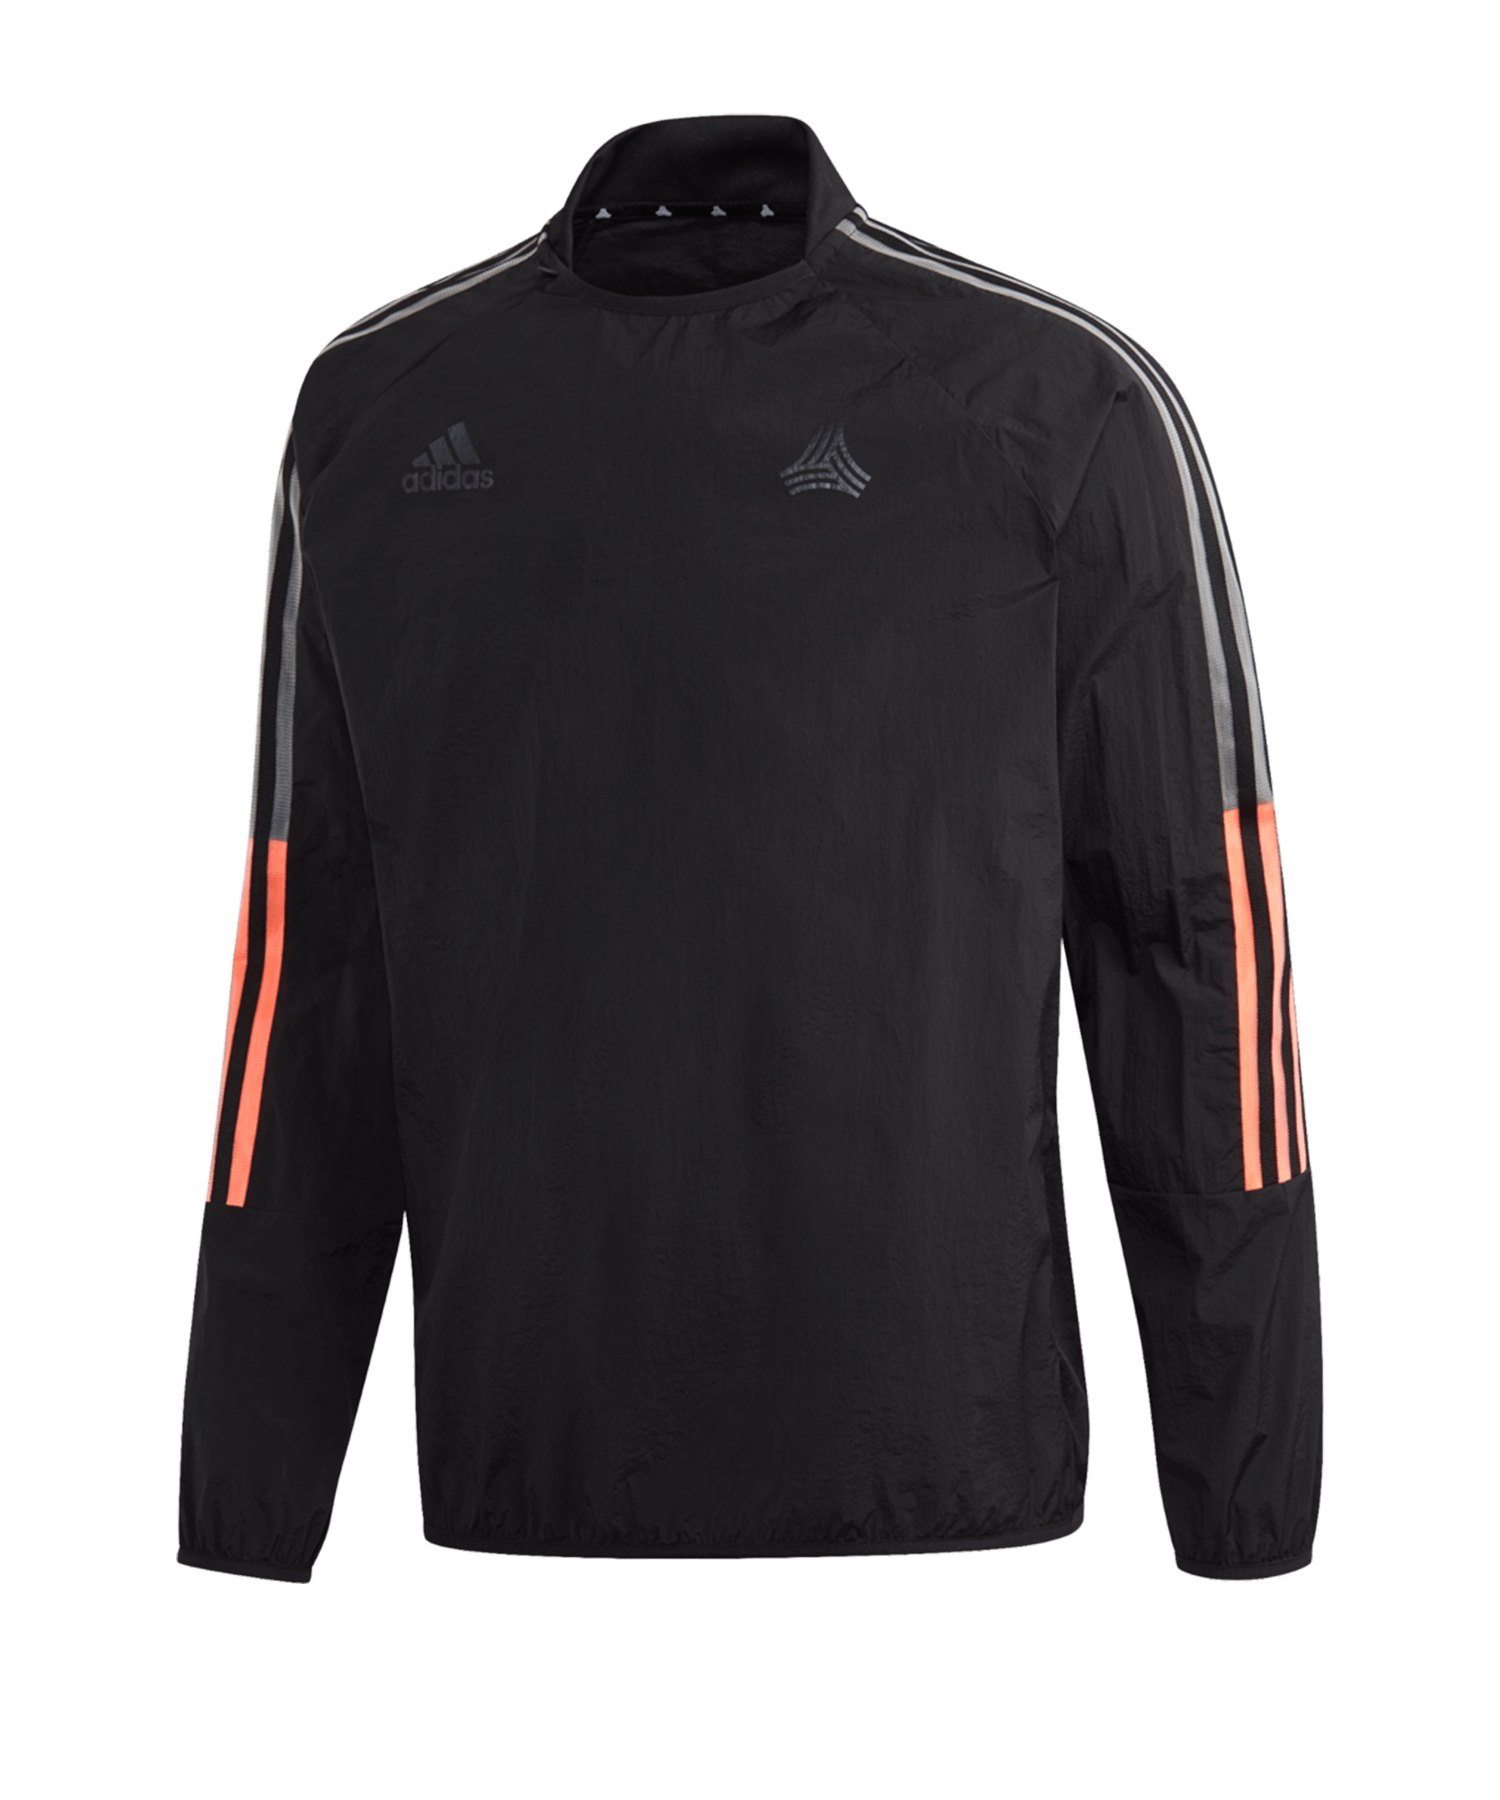 adidas Tango ADV Piste Sweatshirt Schwarz - schwarz